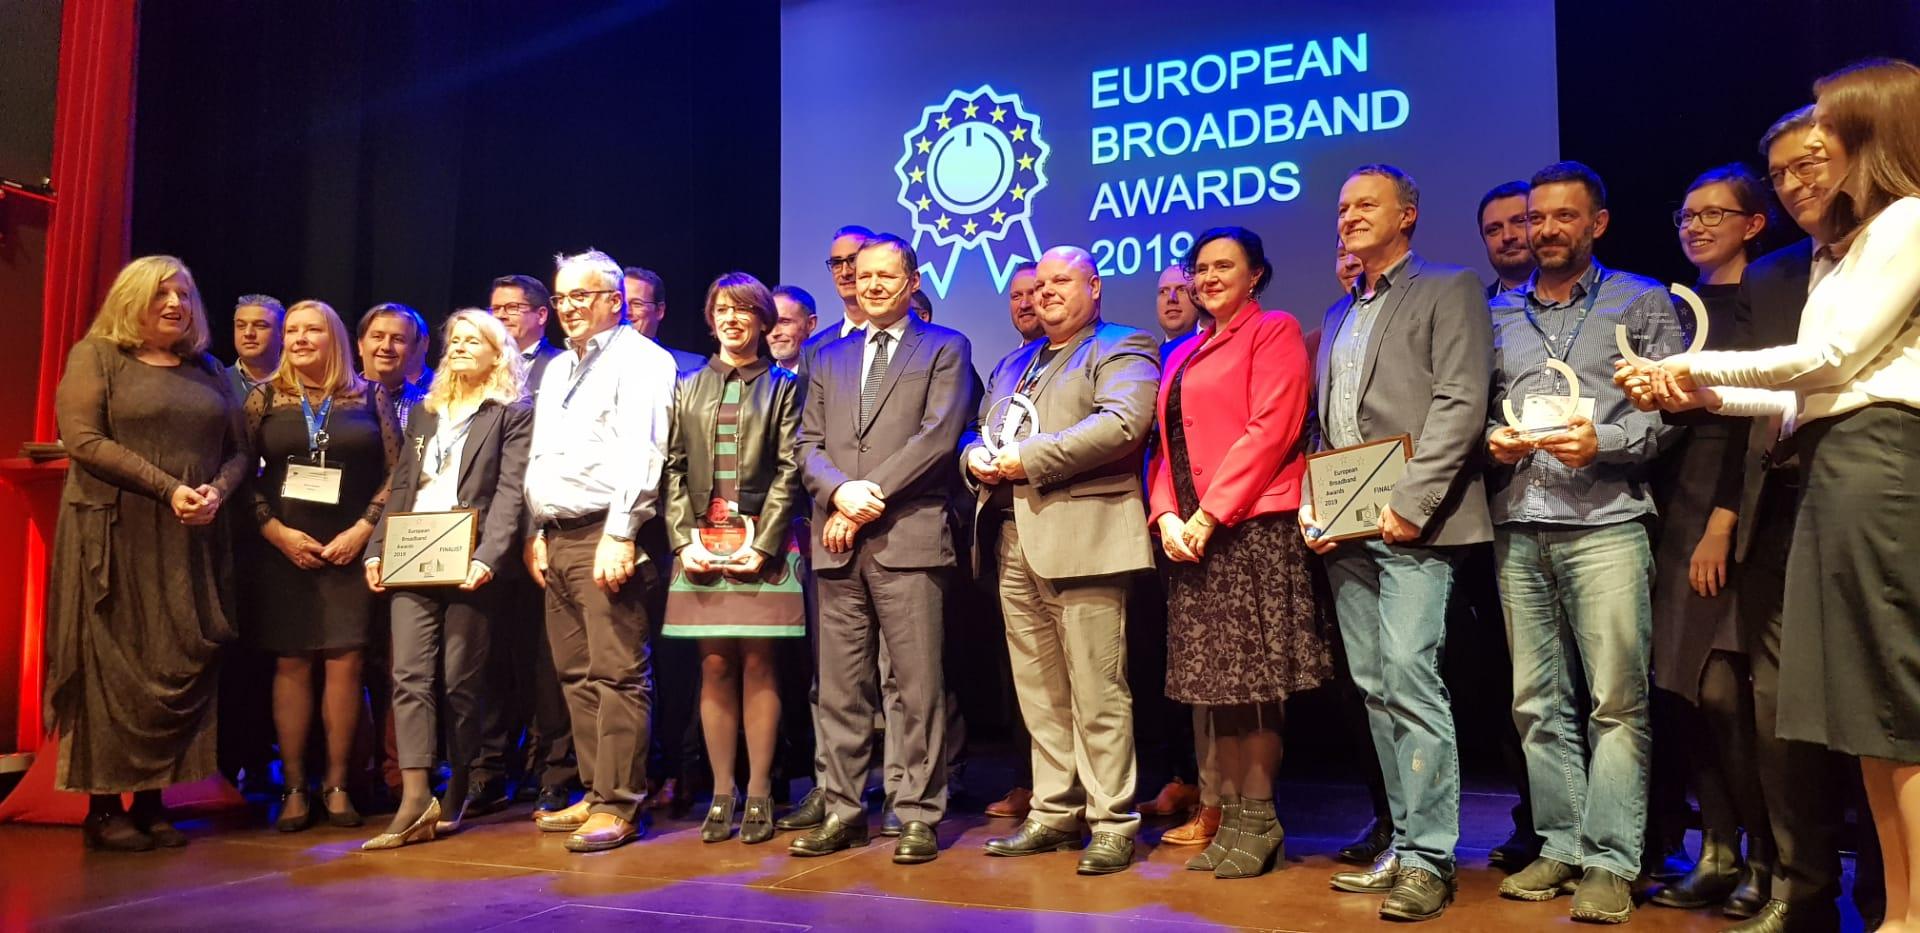 premio_europeo_banda_ancha_98EB42477487.jpeg